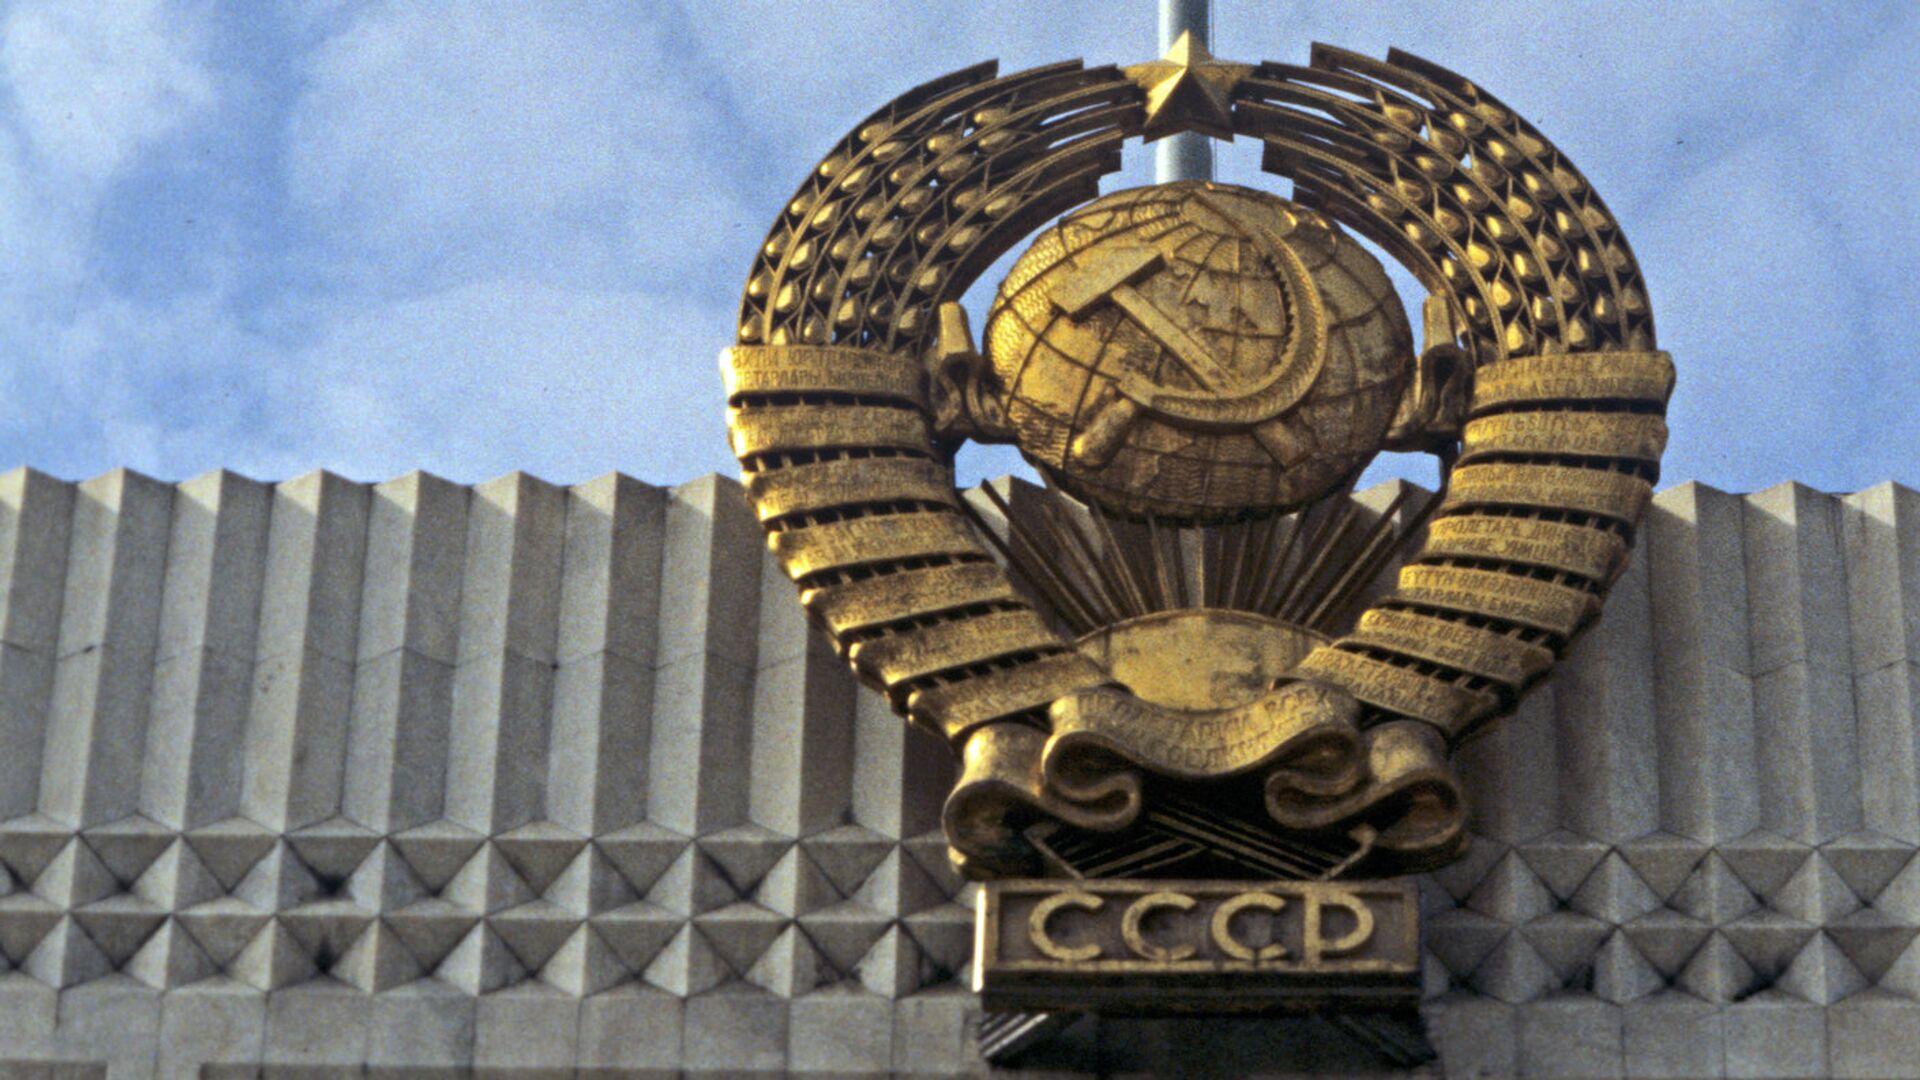 Герб СССР - РИА Новости, 1920, 09.10.2020